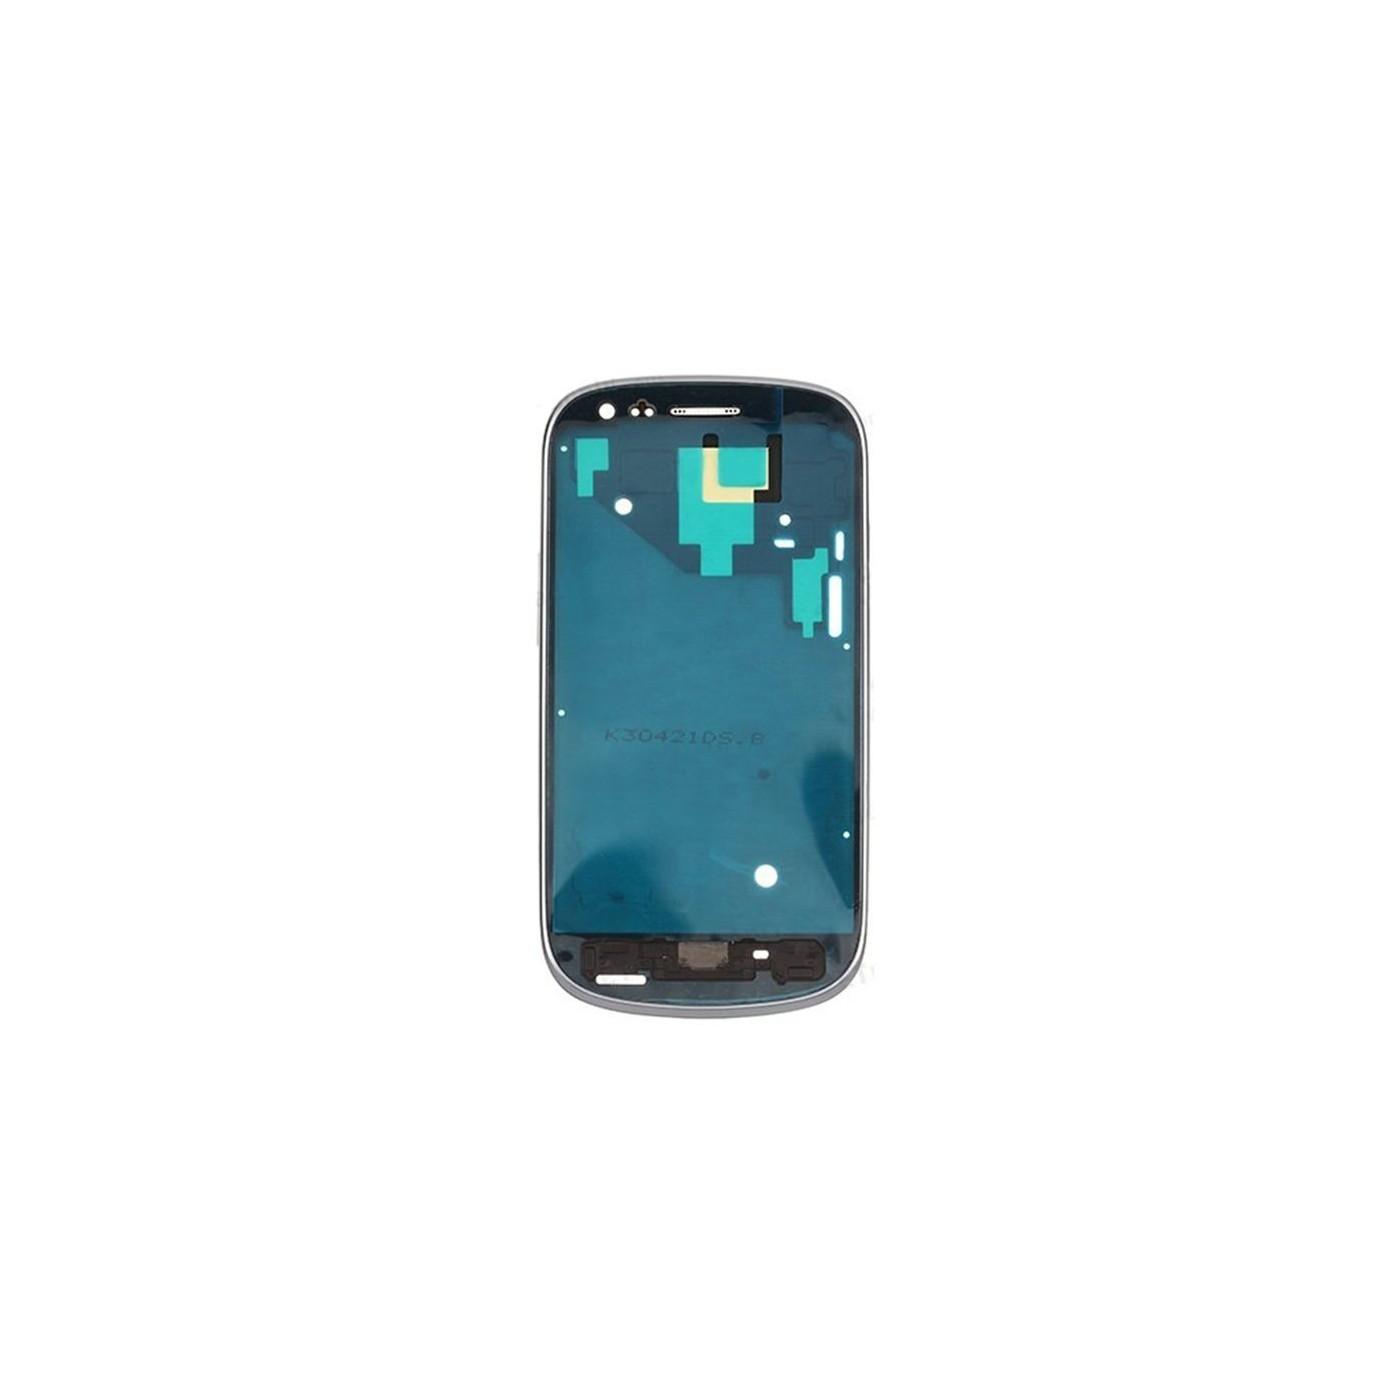 Frame Telaio Scocca Samsung Galaxy S3 mini I8190 bianco Cornice Centrale